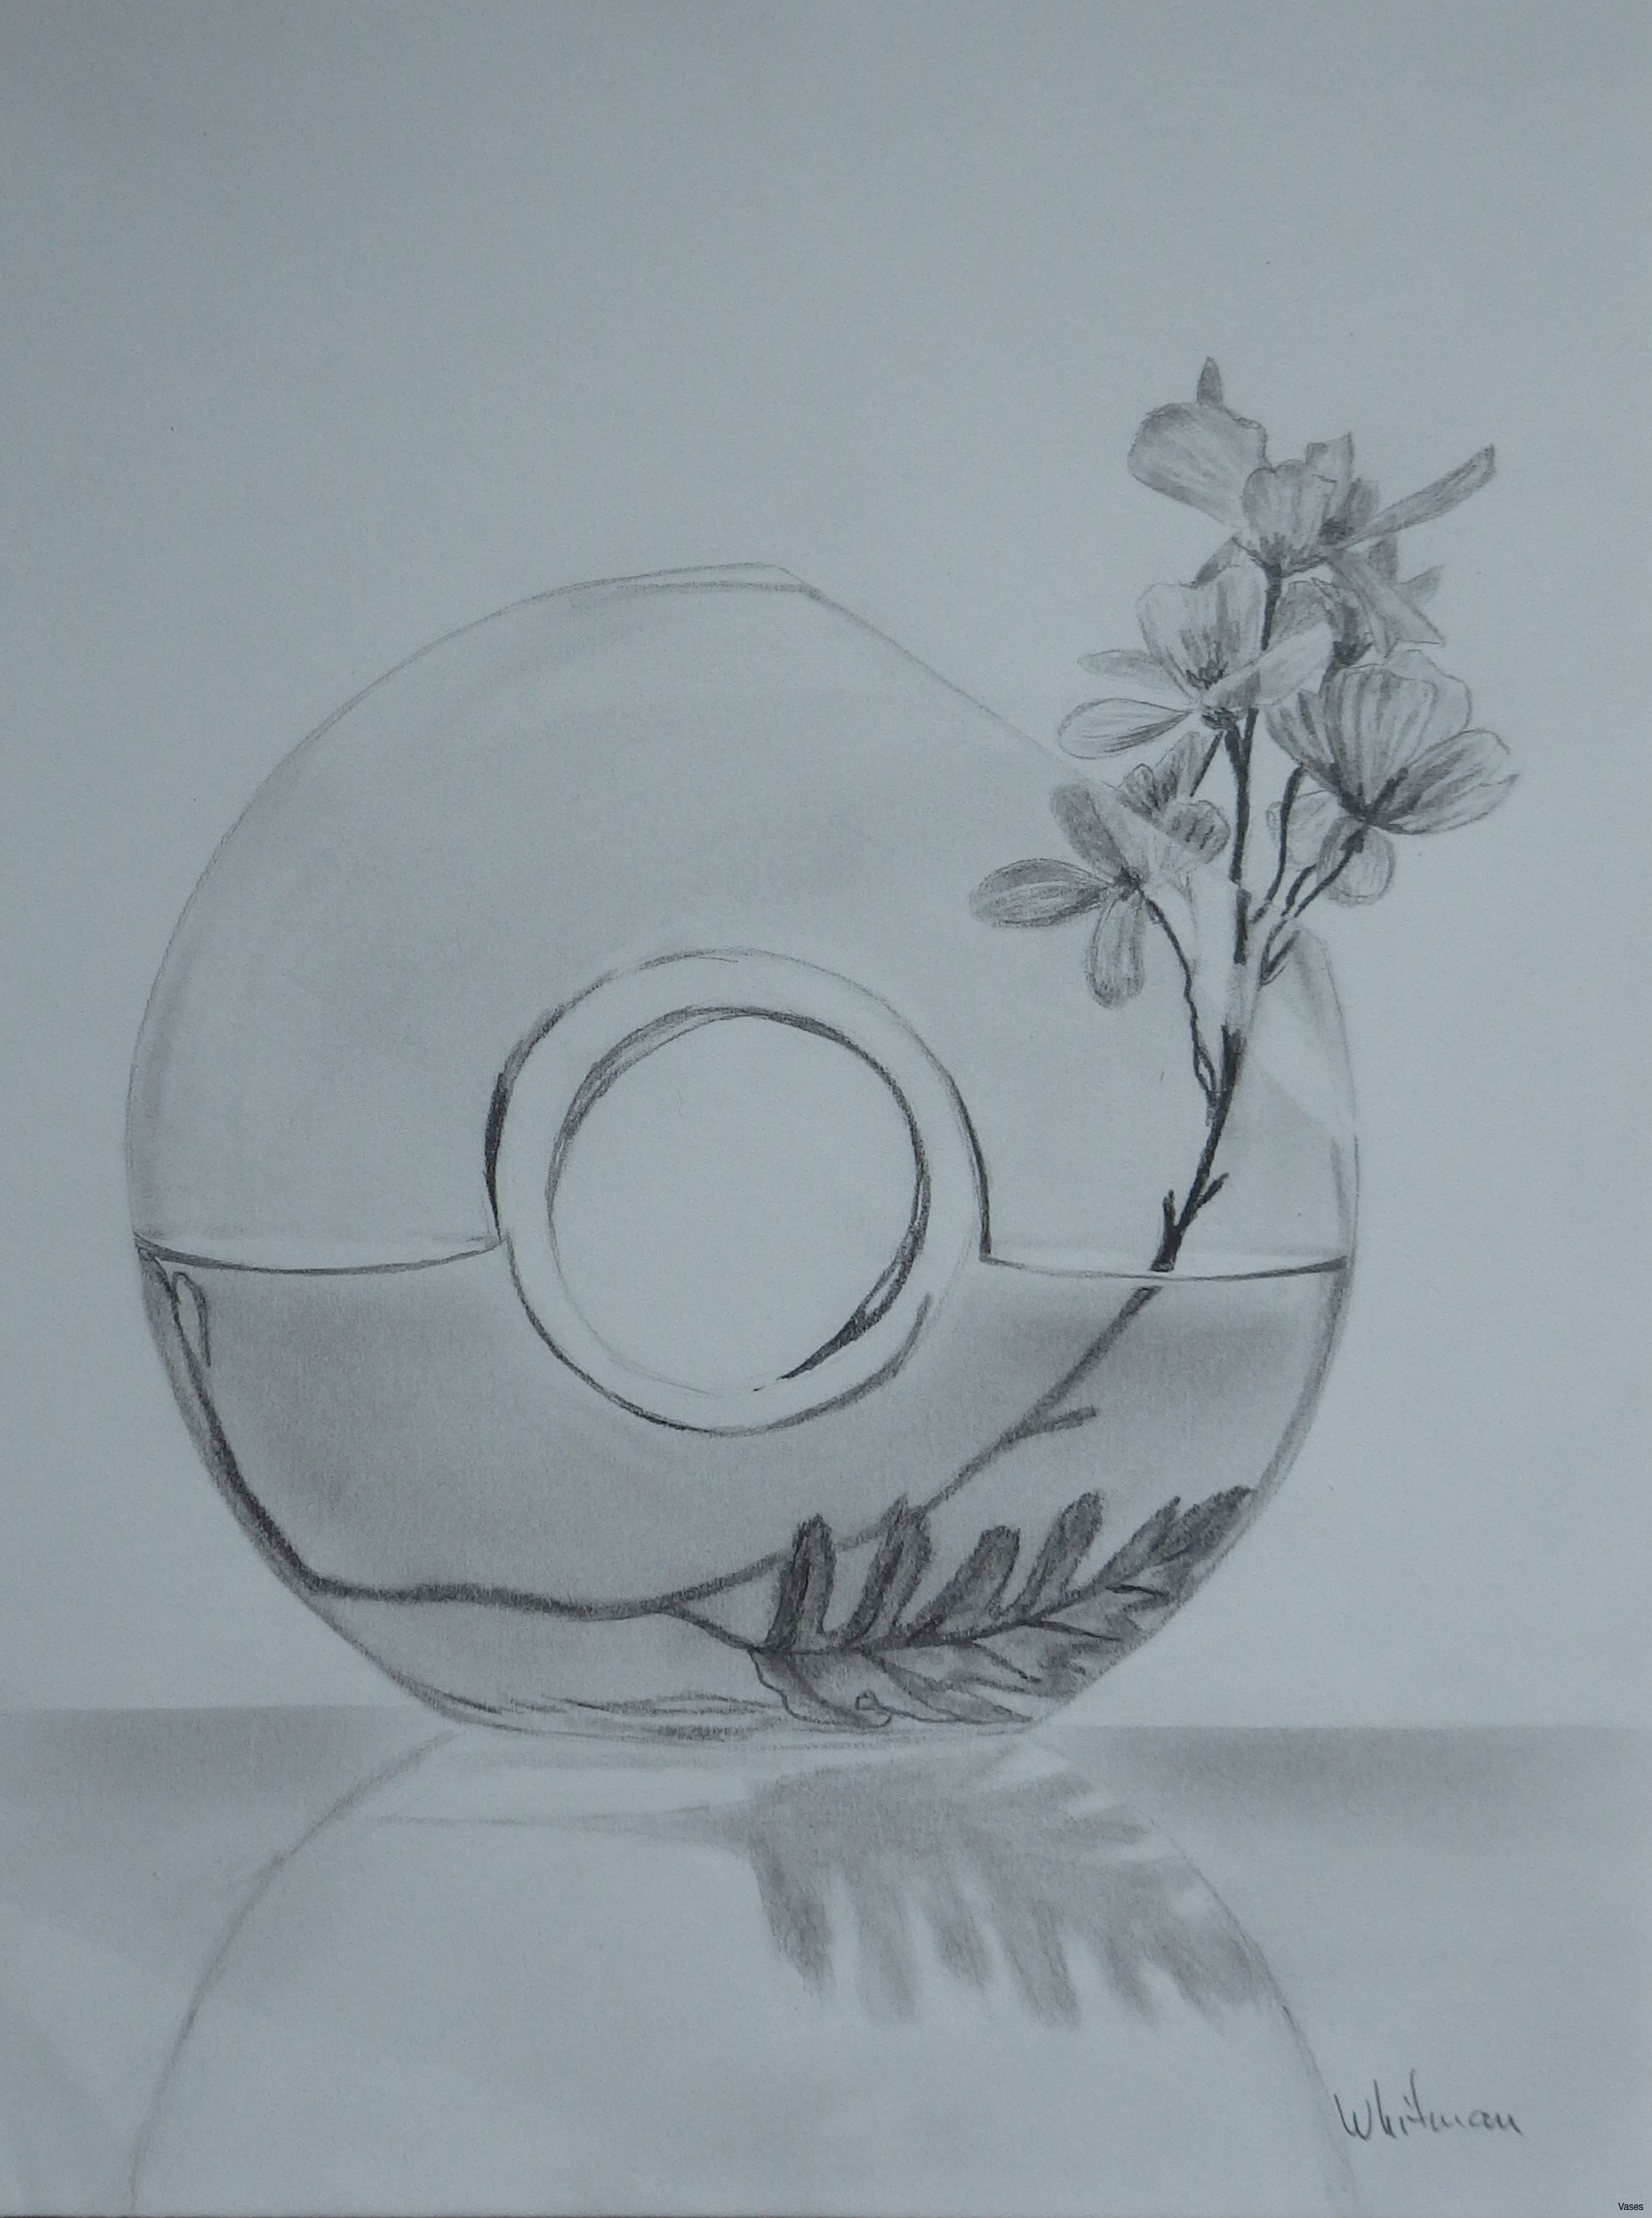 2057x2761 Drawn Vase Pencil Drawing 8h Vases Sketch Of Pin Still Life Flower